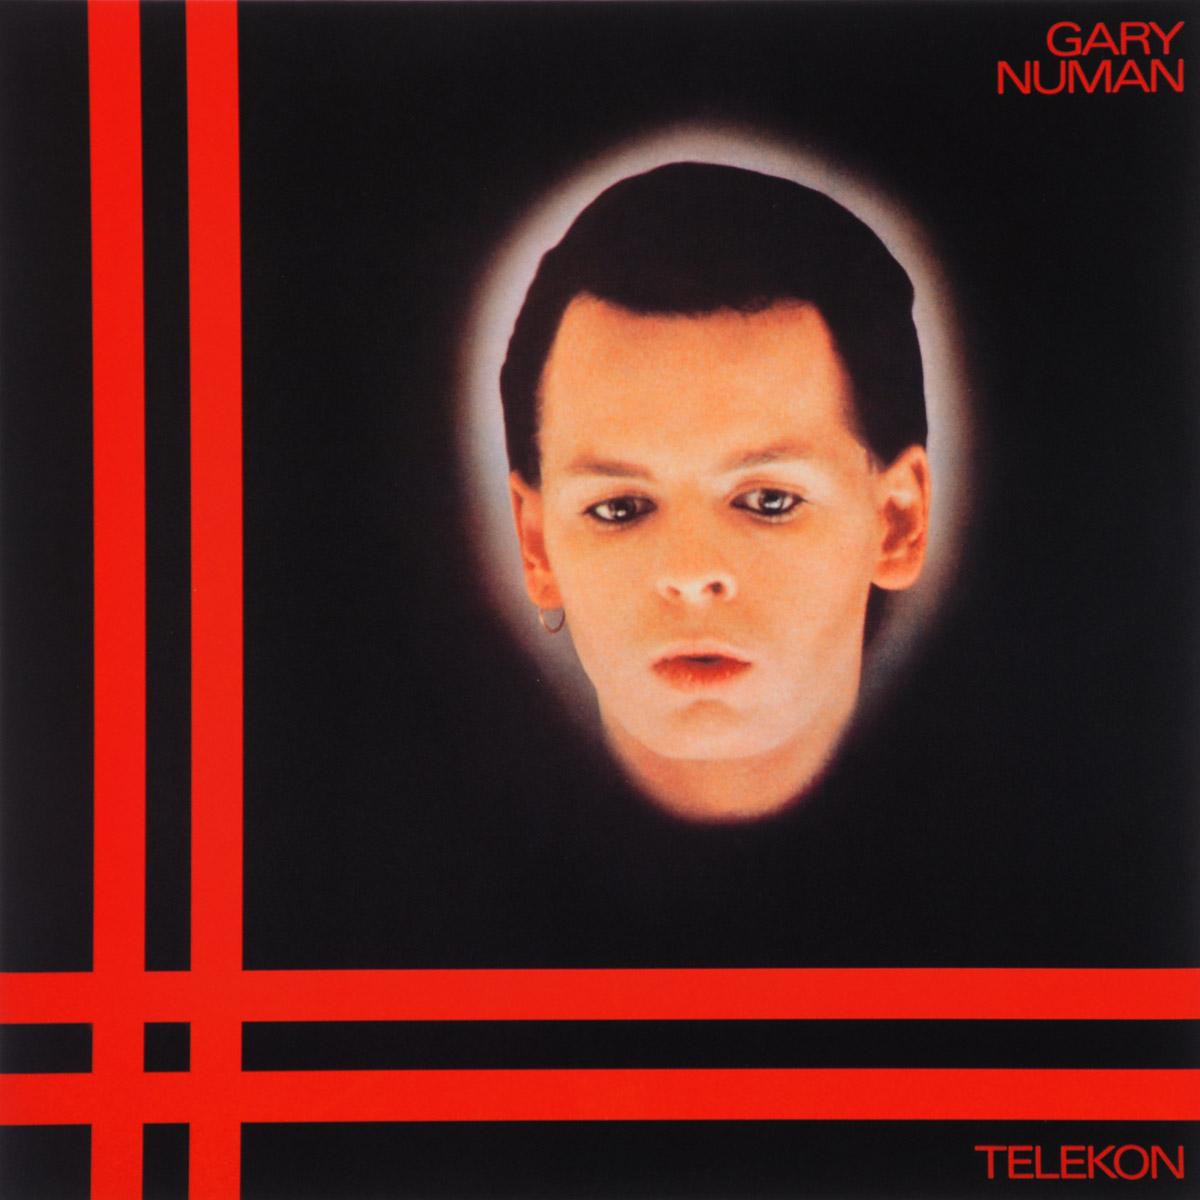 Гари Ньюмен Gary Numan. Telekon (2 LP) gary numan birmingham